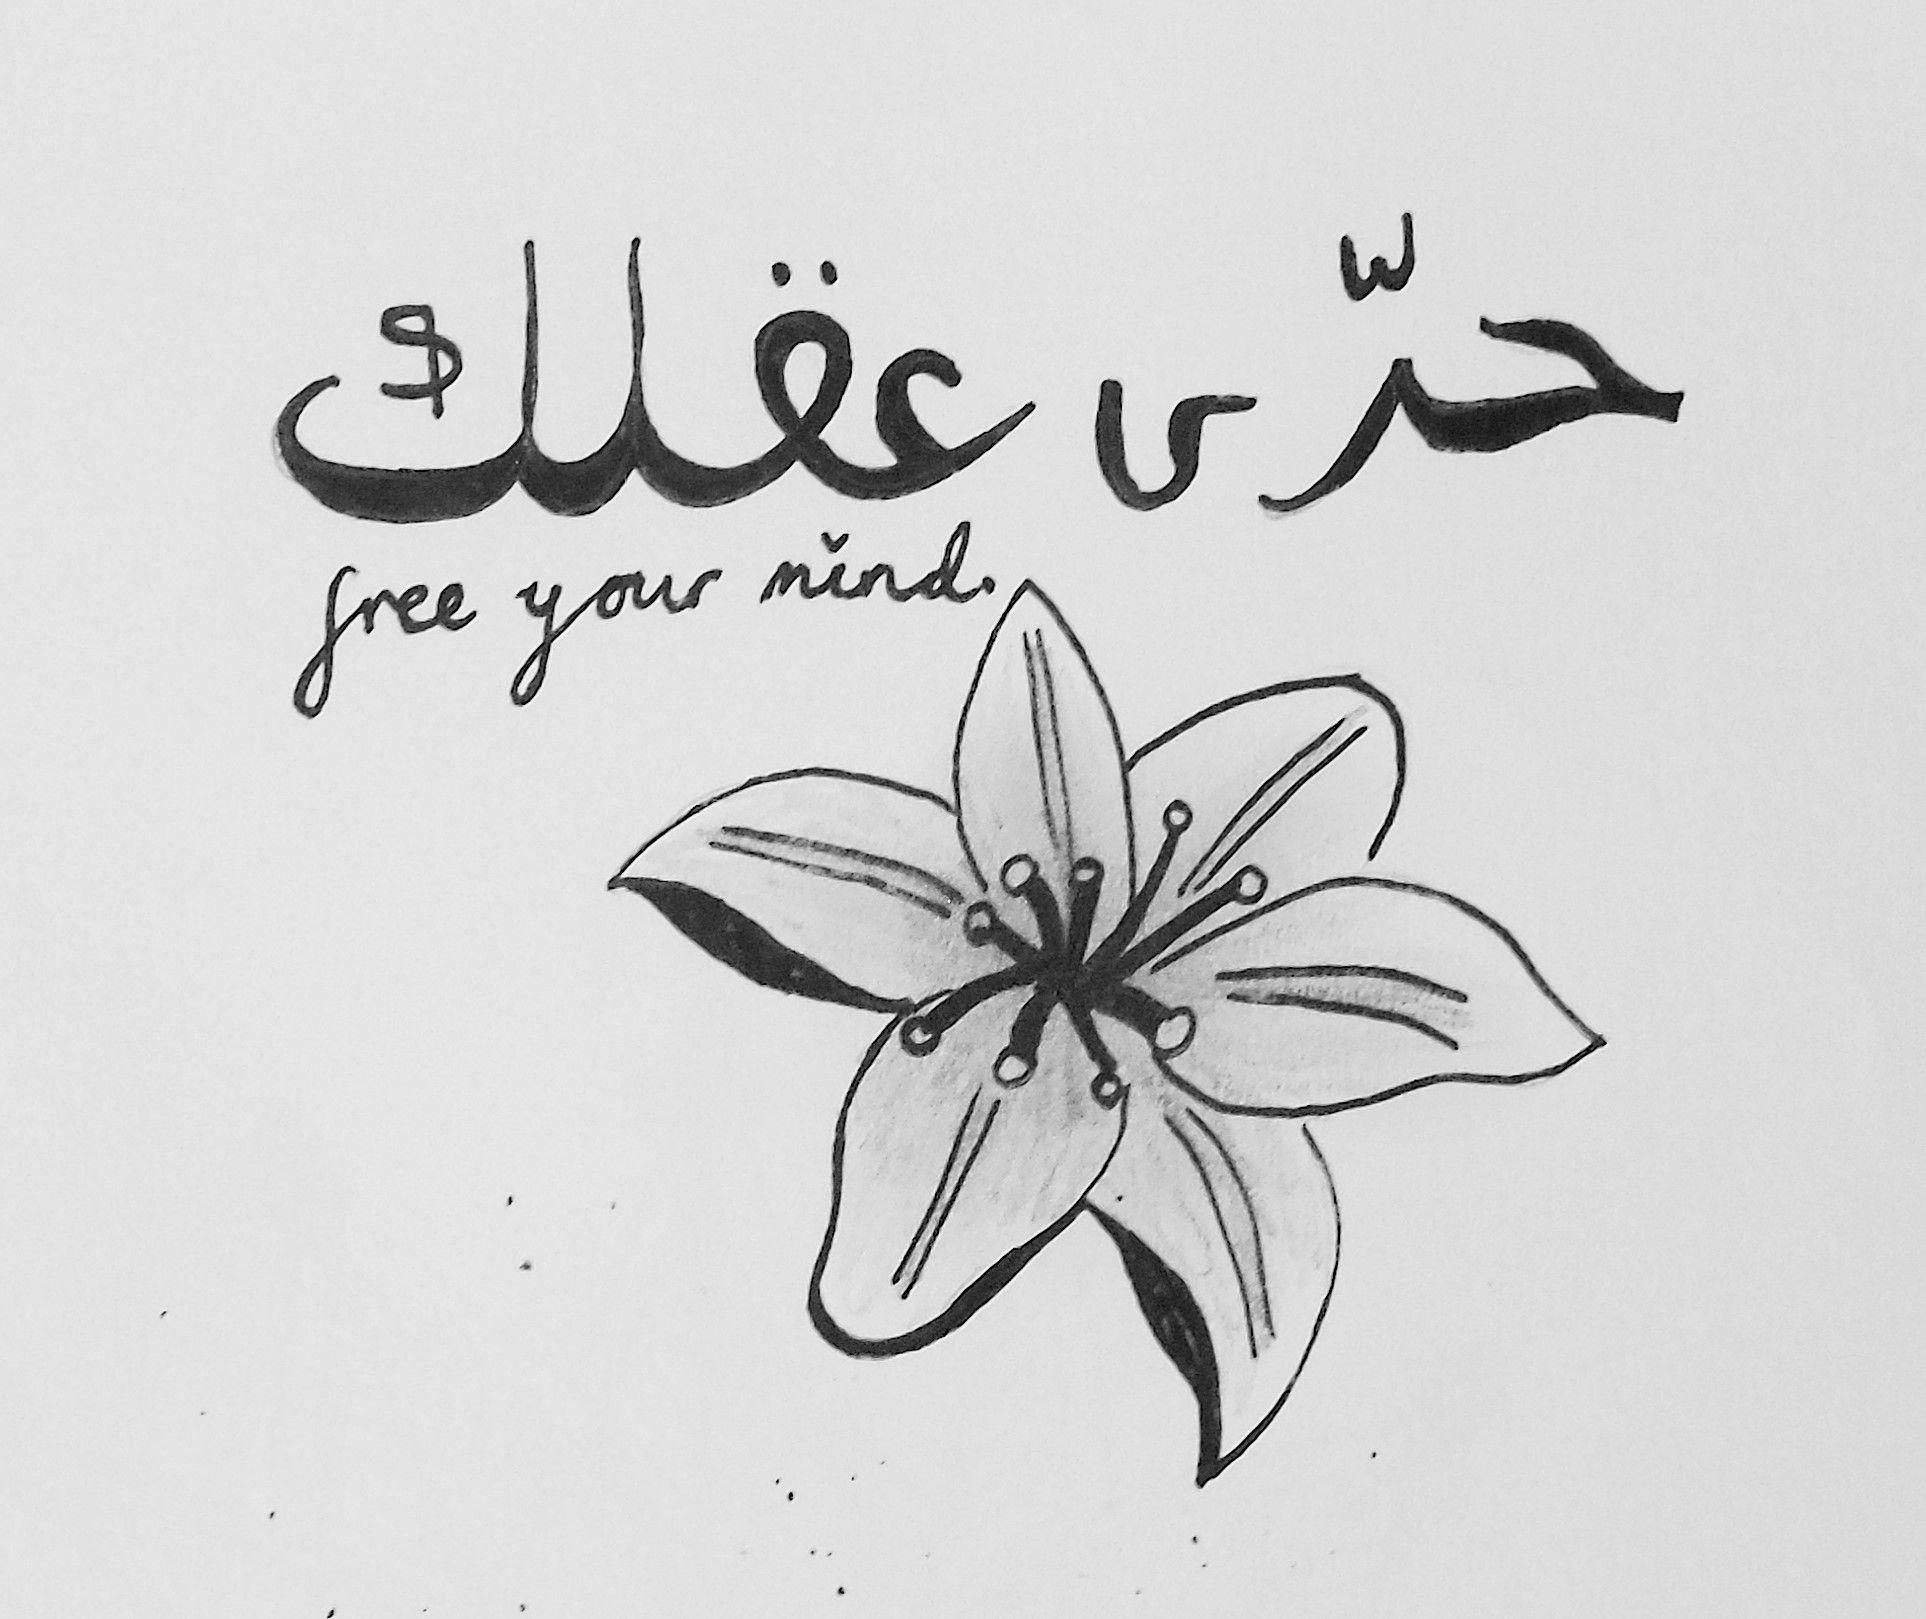 Free your mind moroccan arabic writing lotus frangipani floral free your mind moroccan arabic writing lotus frangipani floral tattoo design izmirmasajfo